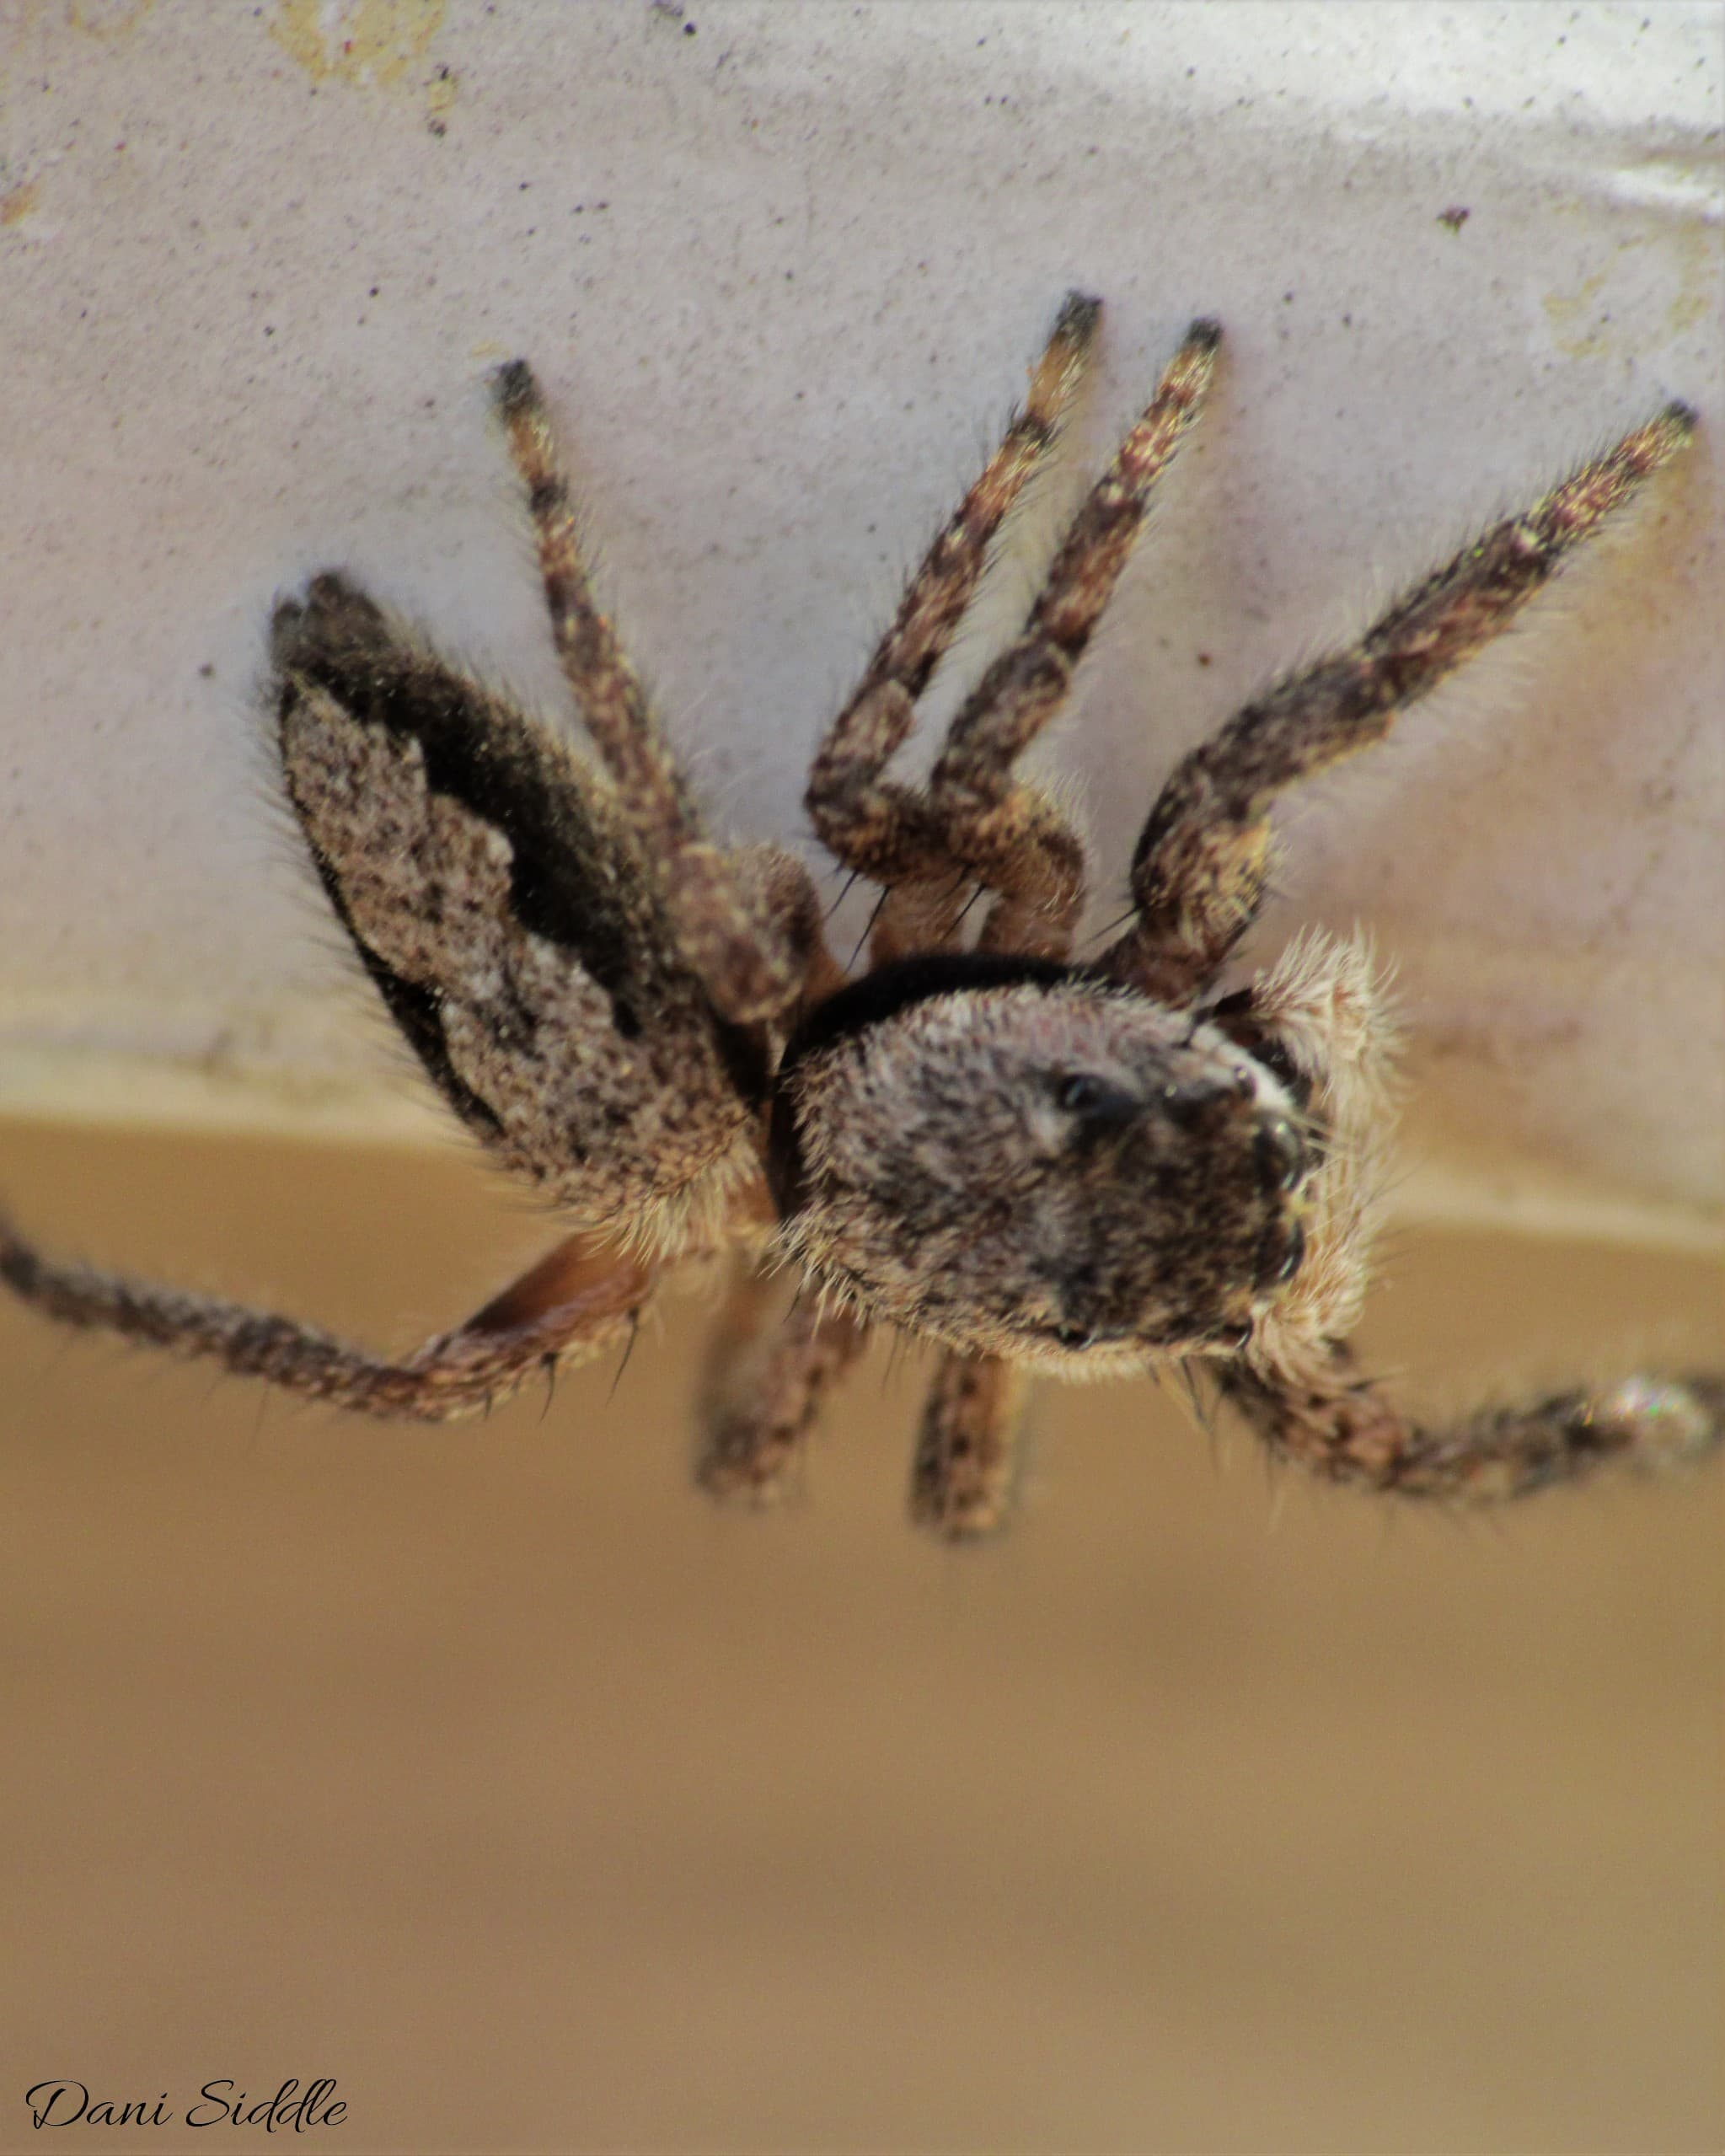 Picture of Platycryptus undatus (Tan Jumping Spider) - Female - Dorsal